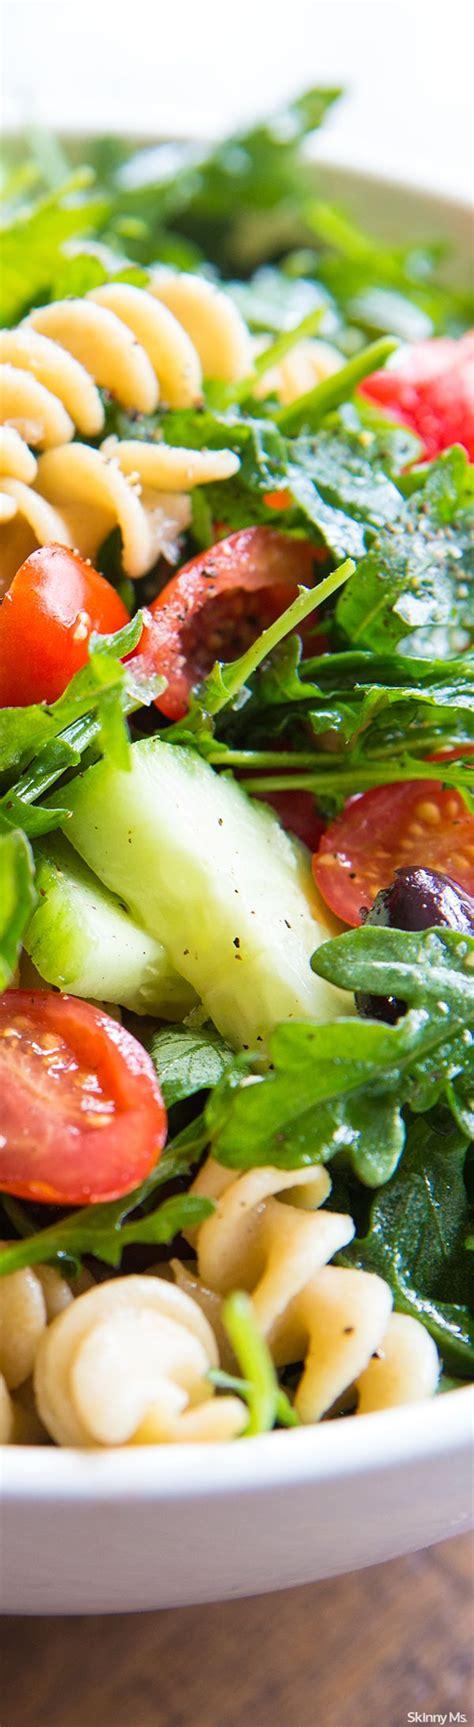 pasta salad dressing recipe easy pasta salad with cucumbers tomatoes recipe